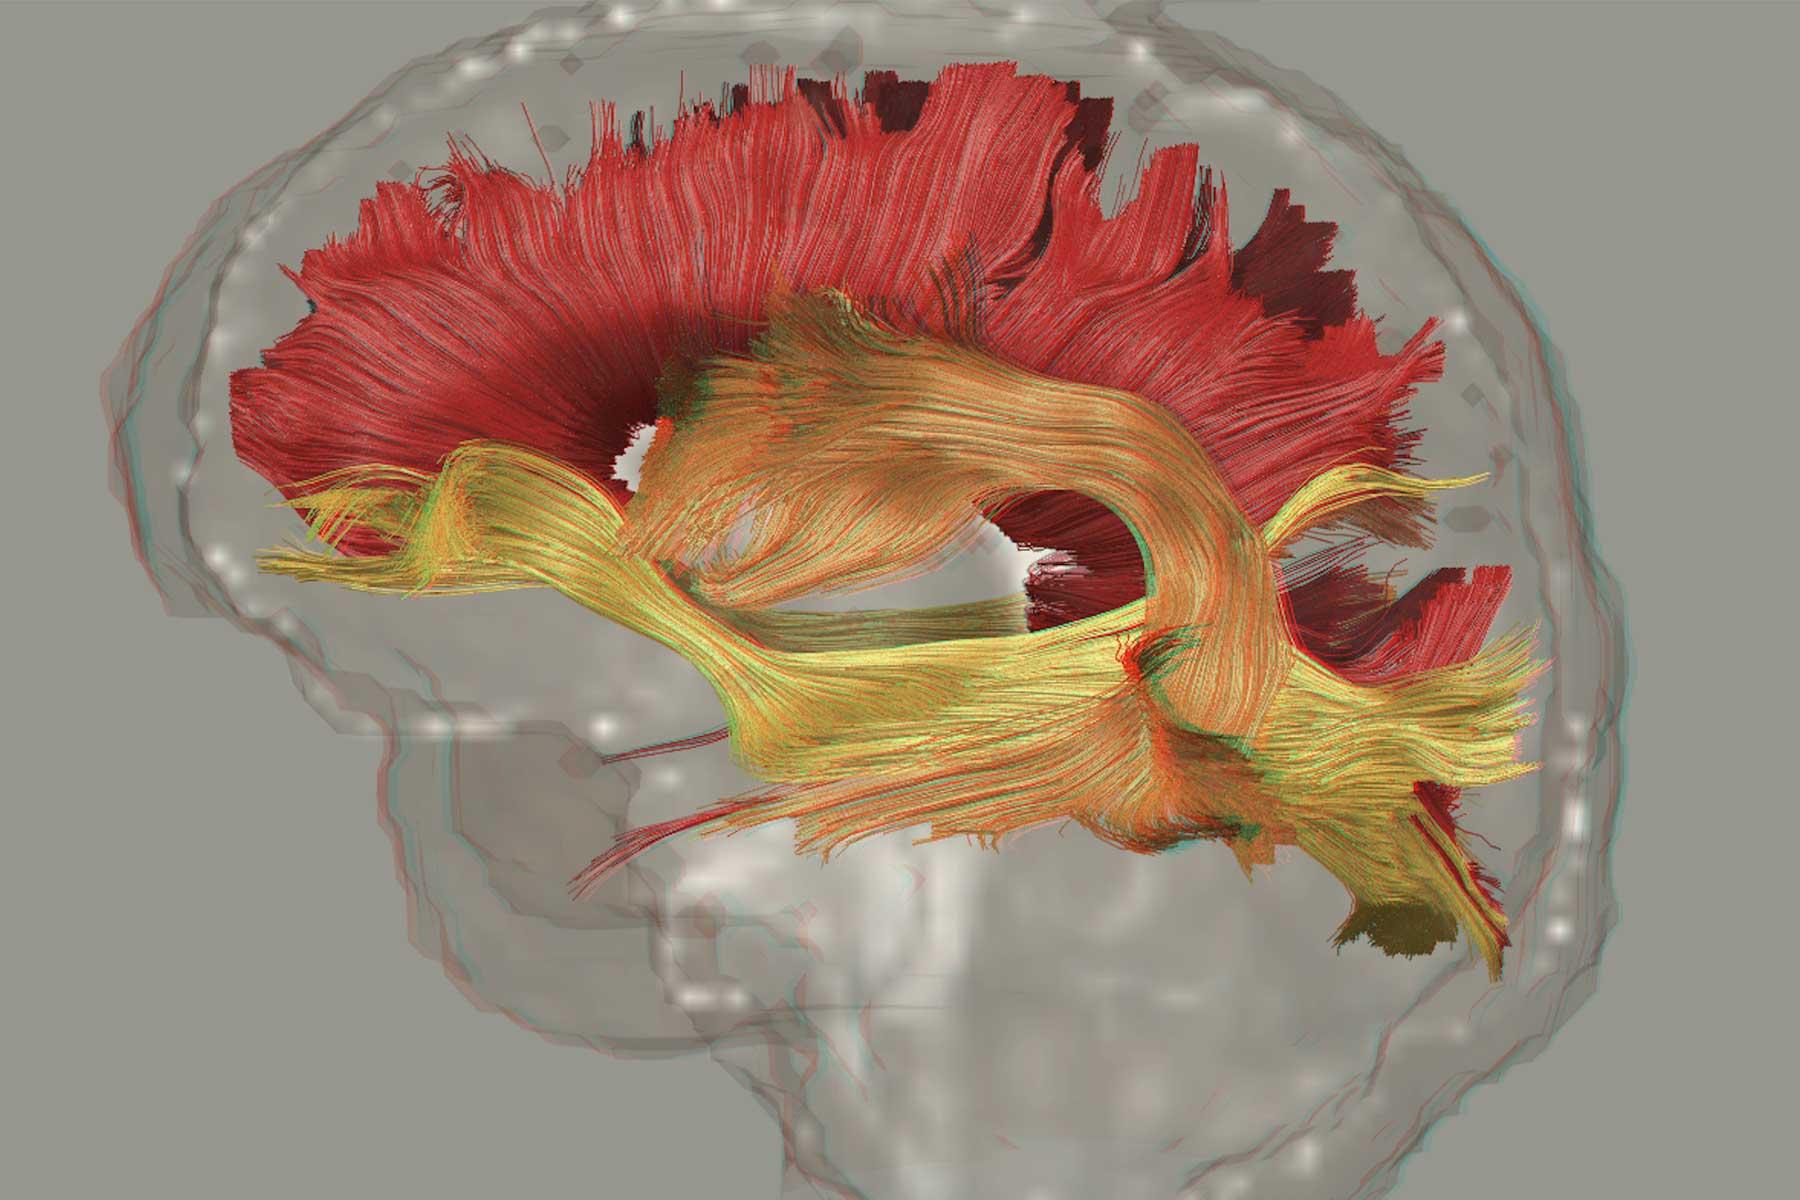 Schizophrenia Found To Disrupt The Brains Entire Communication Wiring Of Brain System Usc News